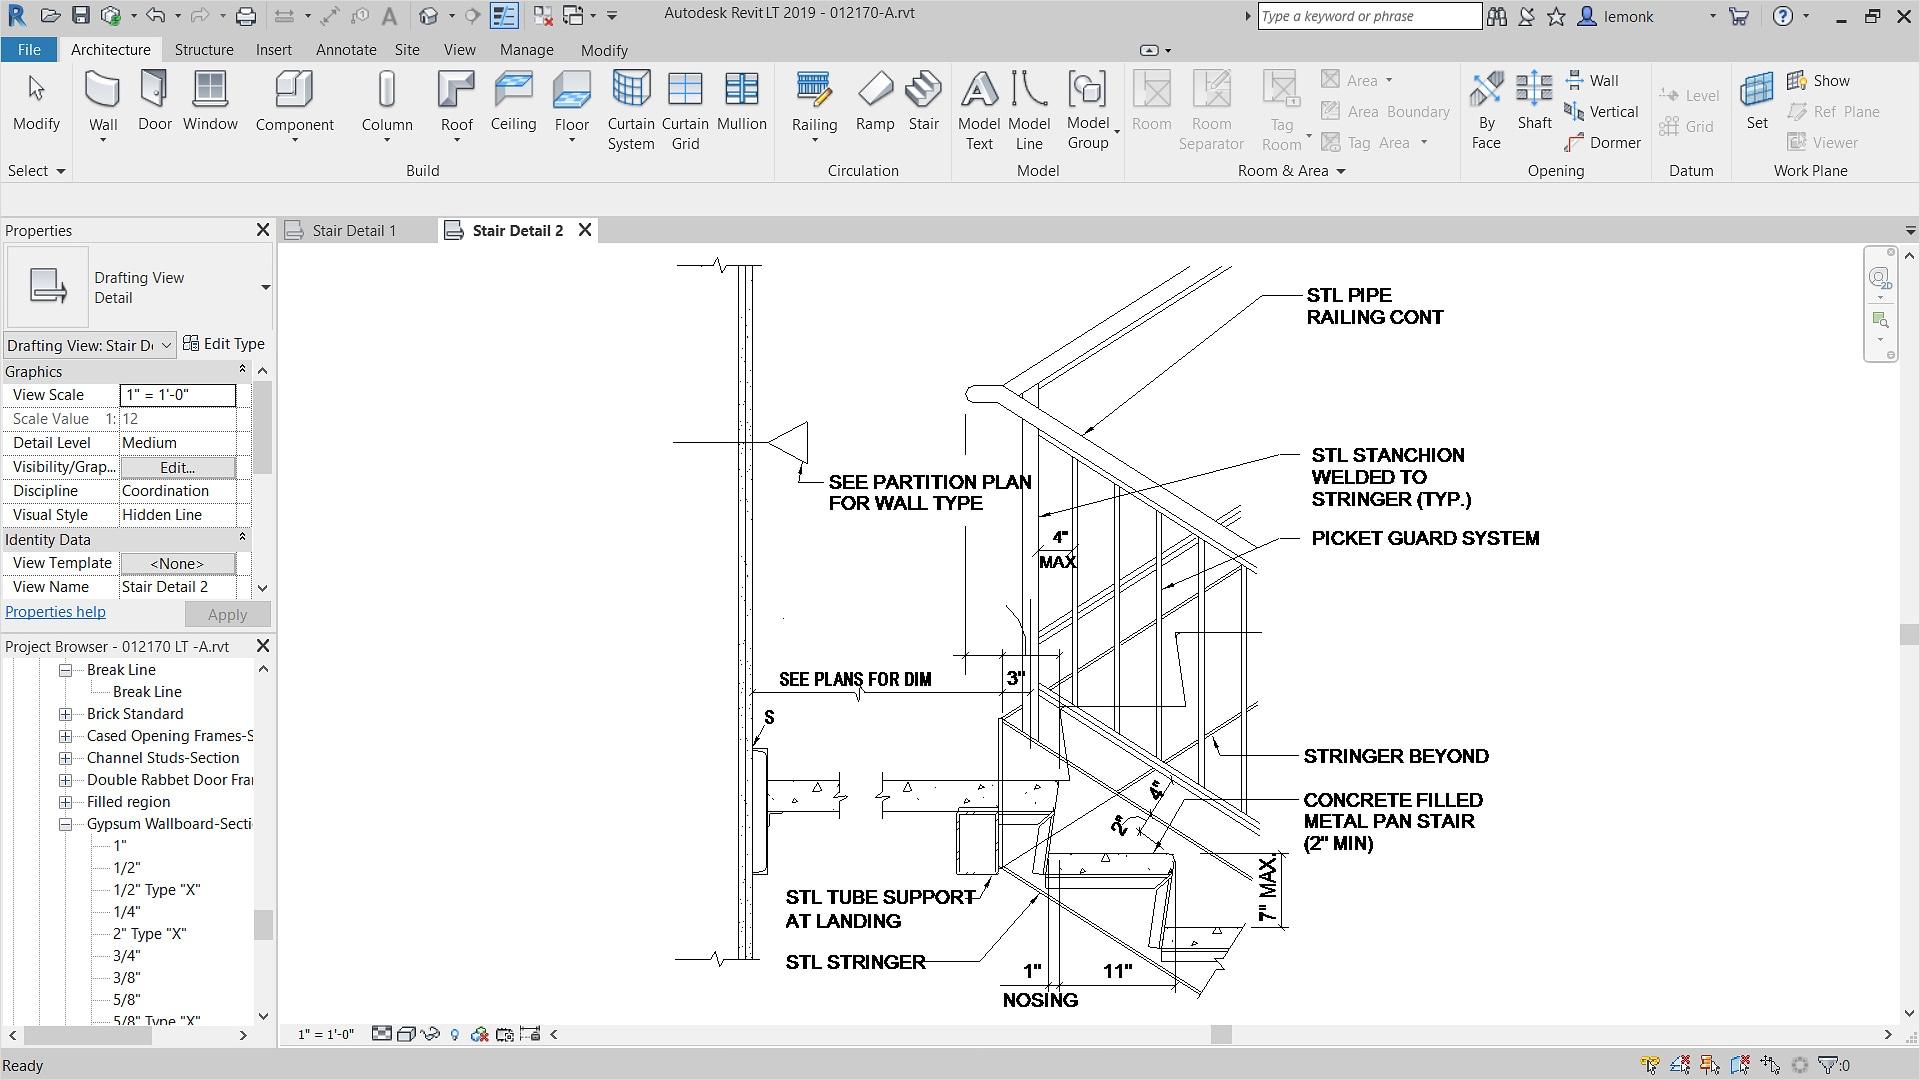 Autodesk Revit LT 2019 price width=